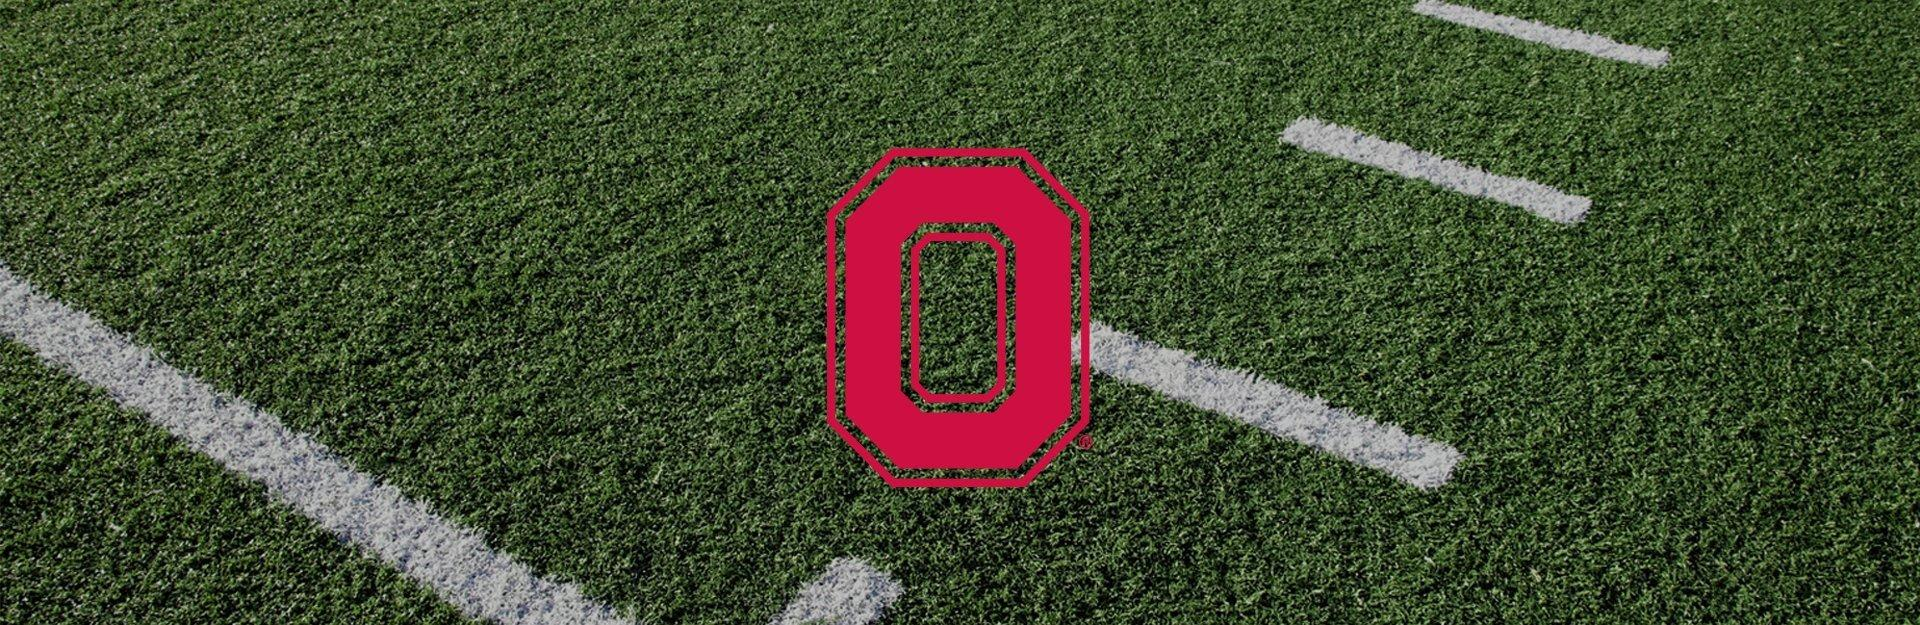 Ohio State logo on football field